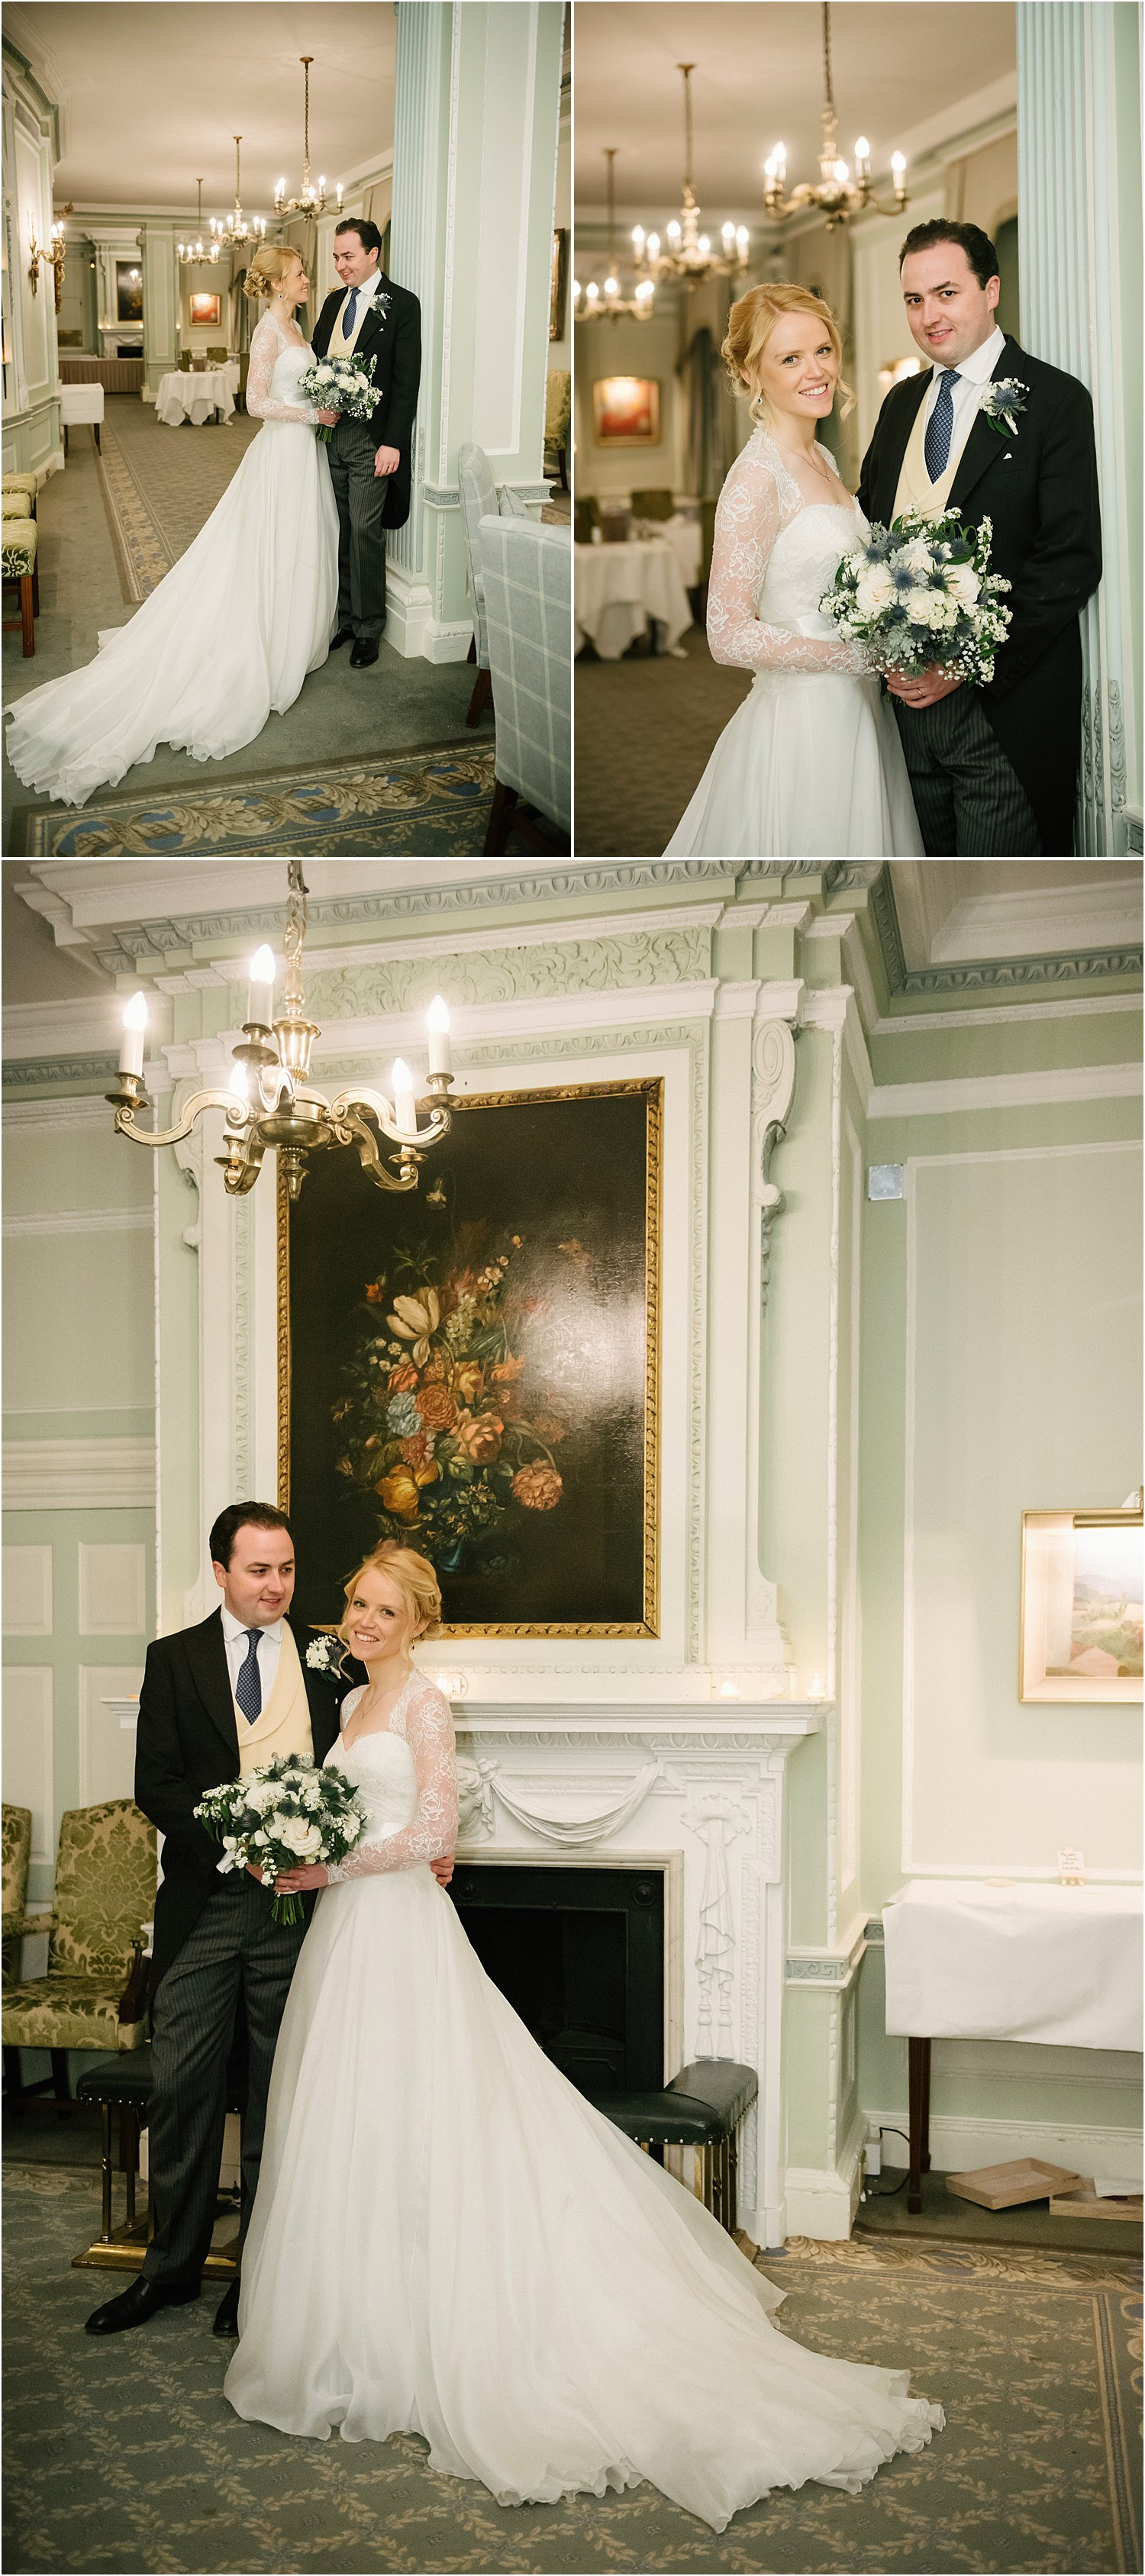 mayfair-classic-wedding-RAC-horse-and-carriage-london-ferdi-annie-lily-sawyer-photo